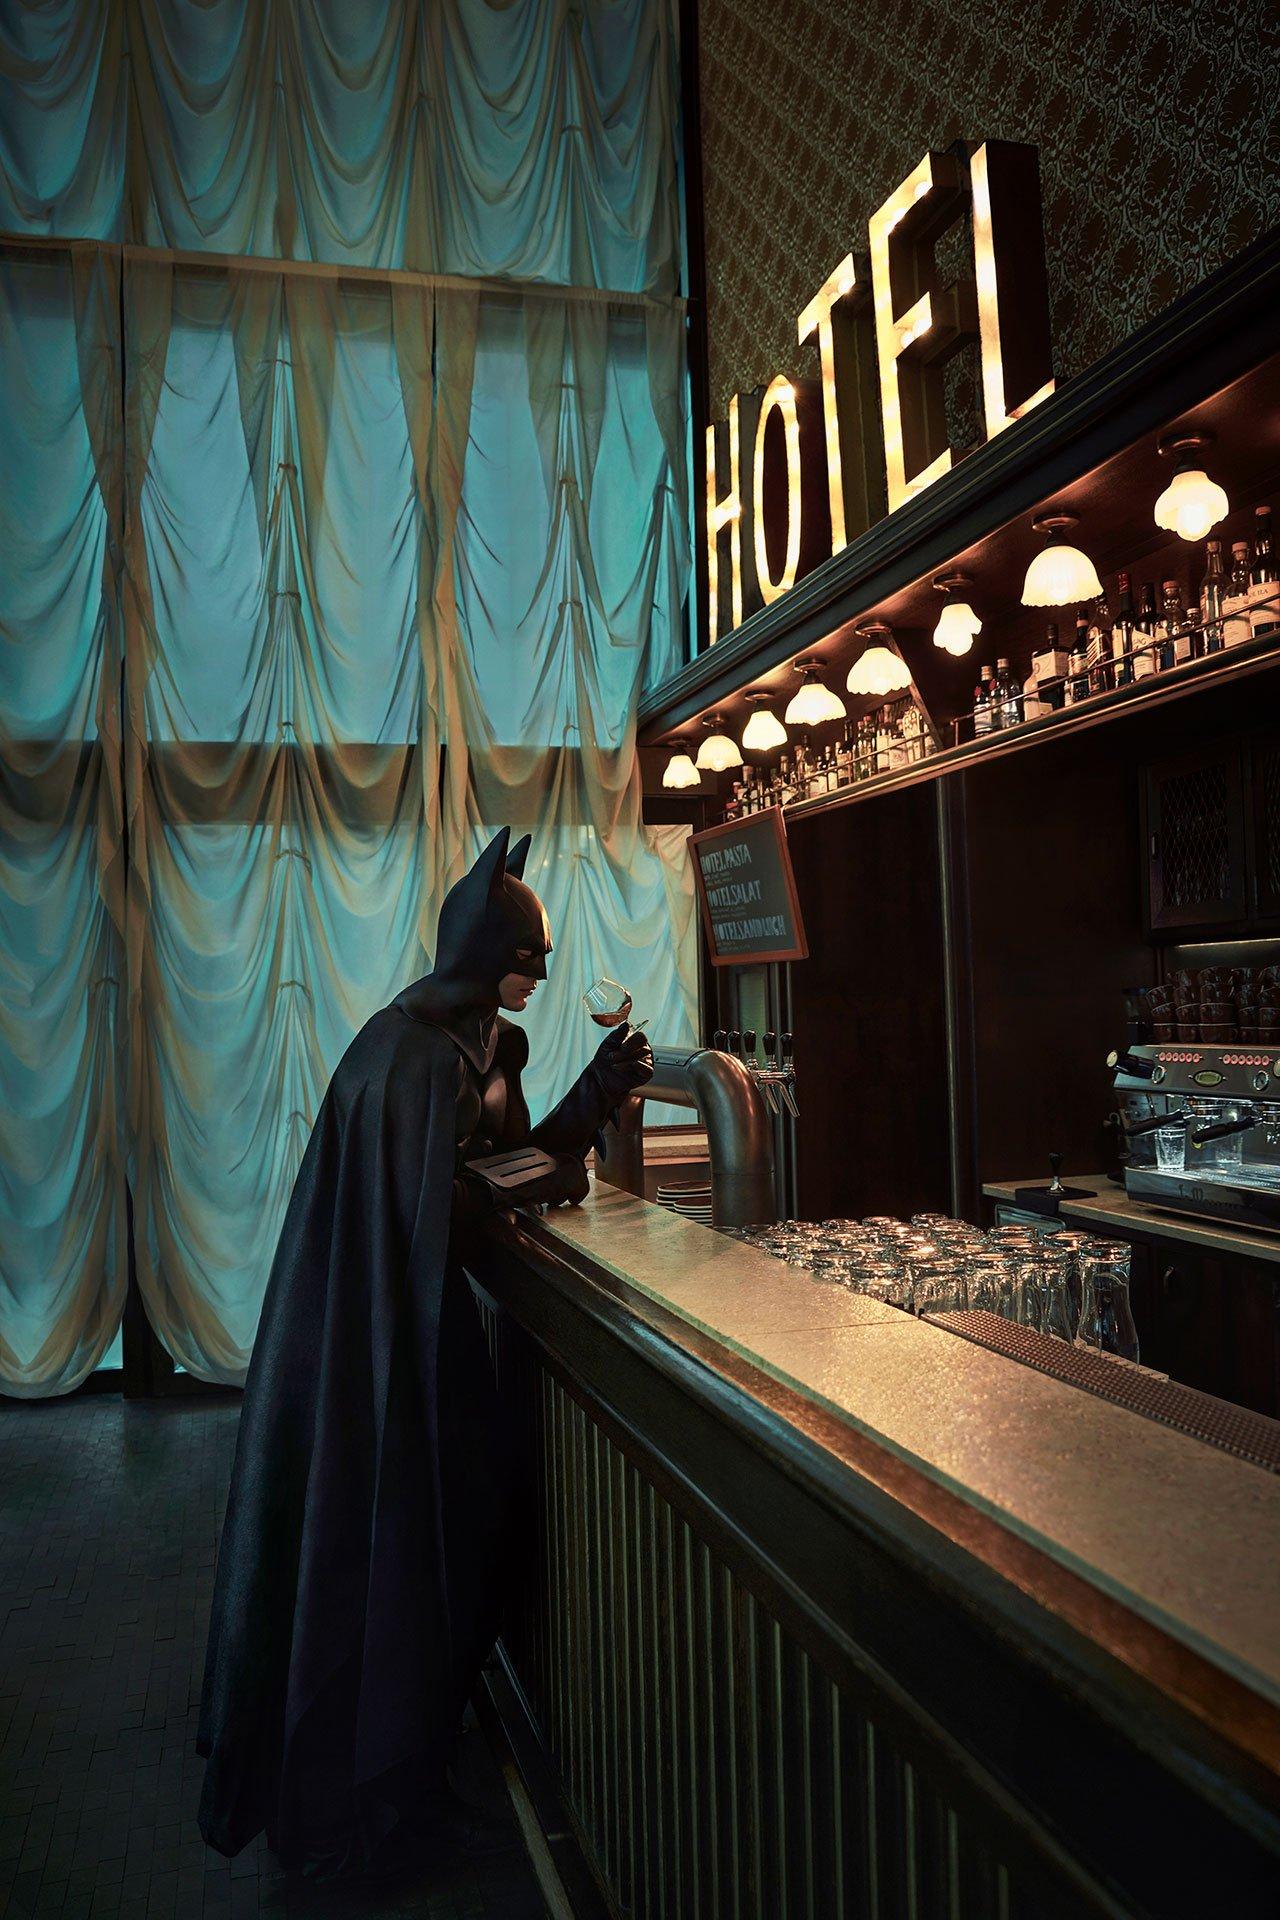 Daily Bat - After Work I. Photography by Sebastian Magnani.